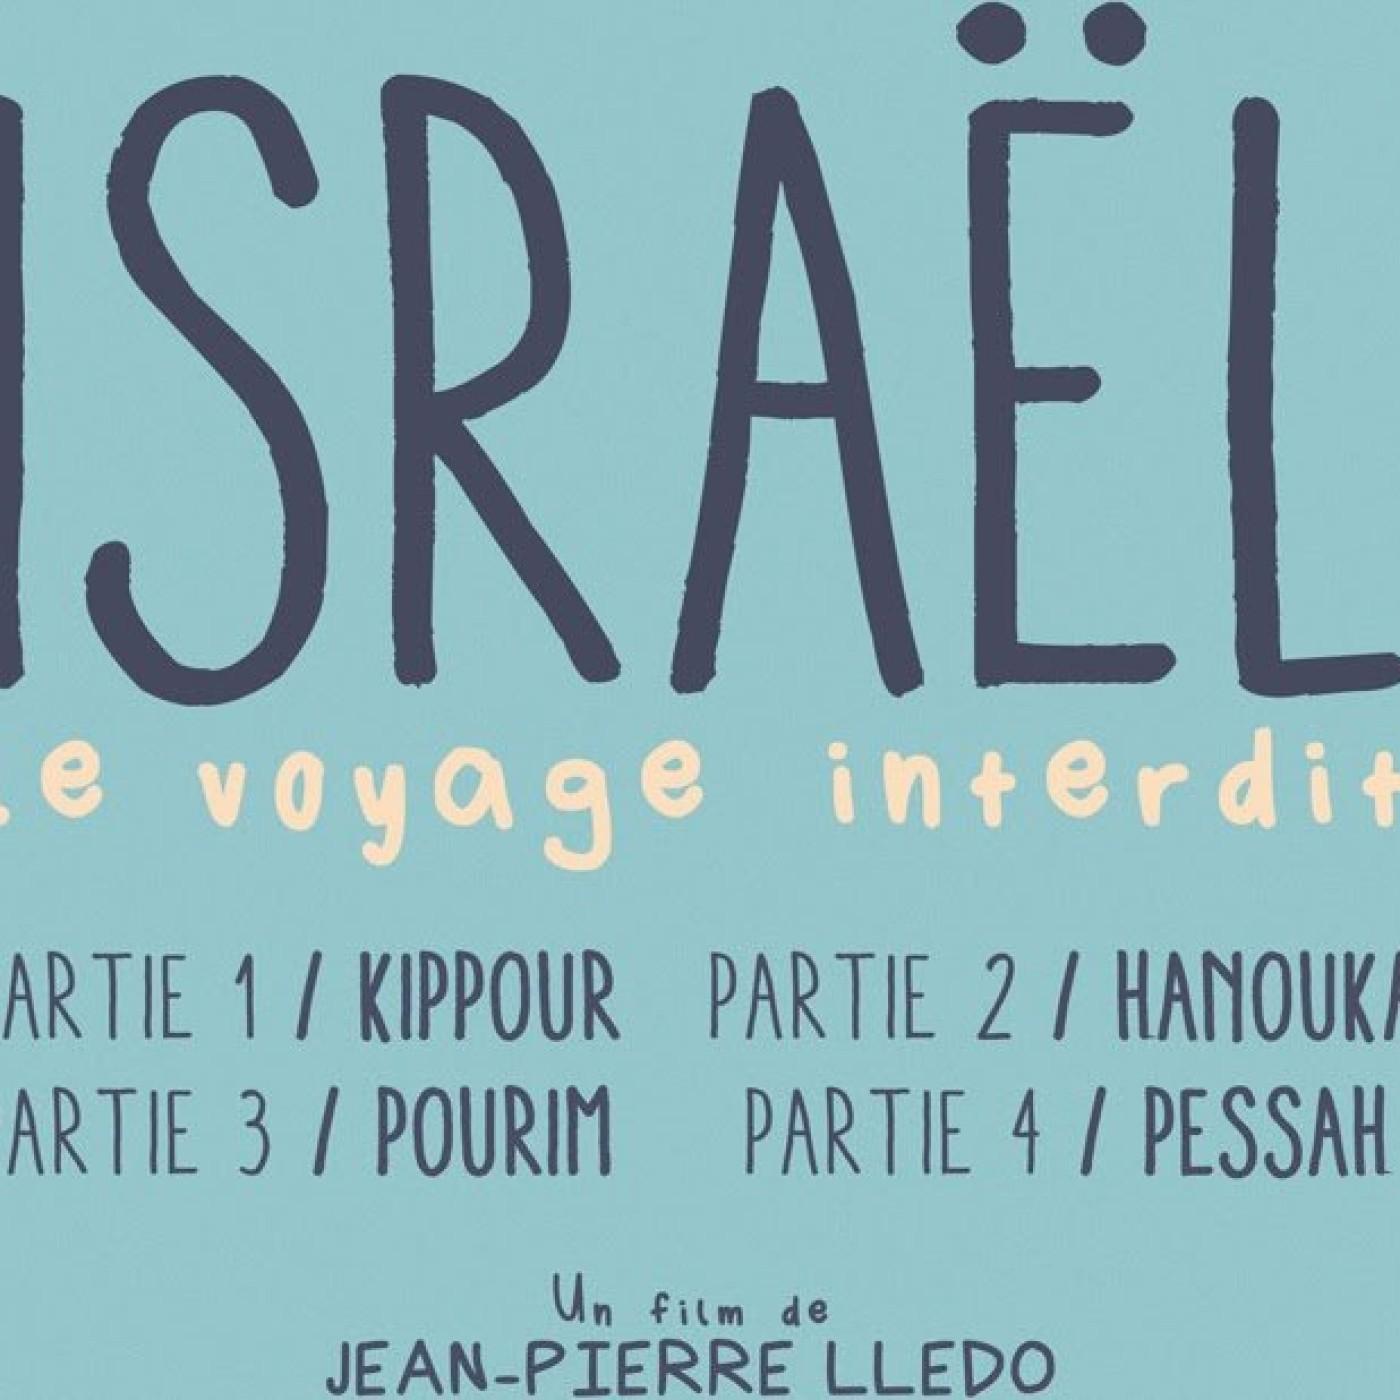 Critique du Film Israël, le voyage interdit - Partie II : Hanouka